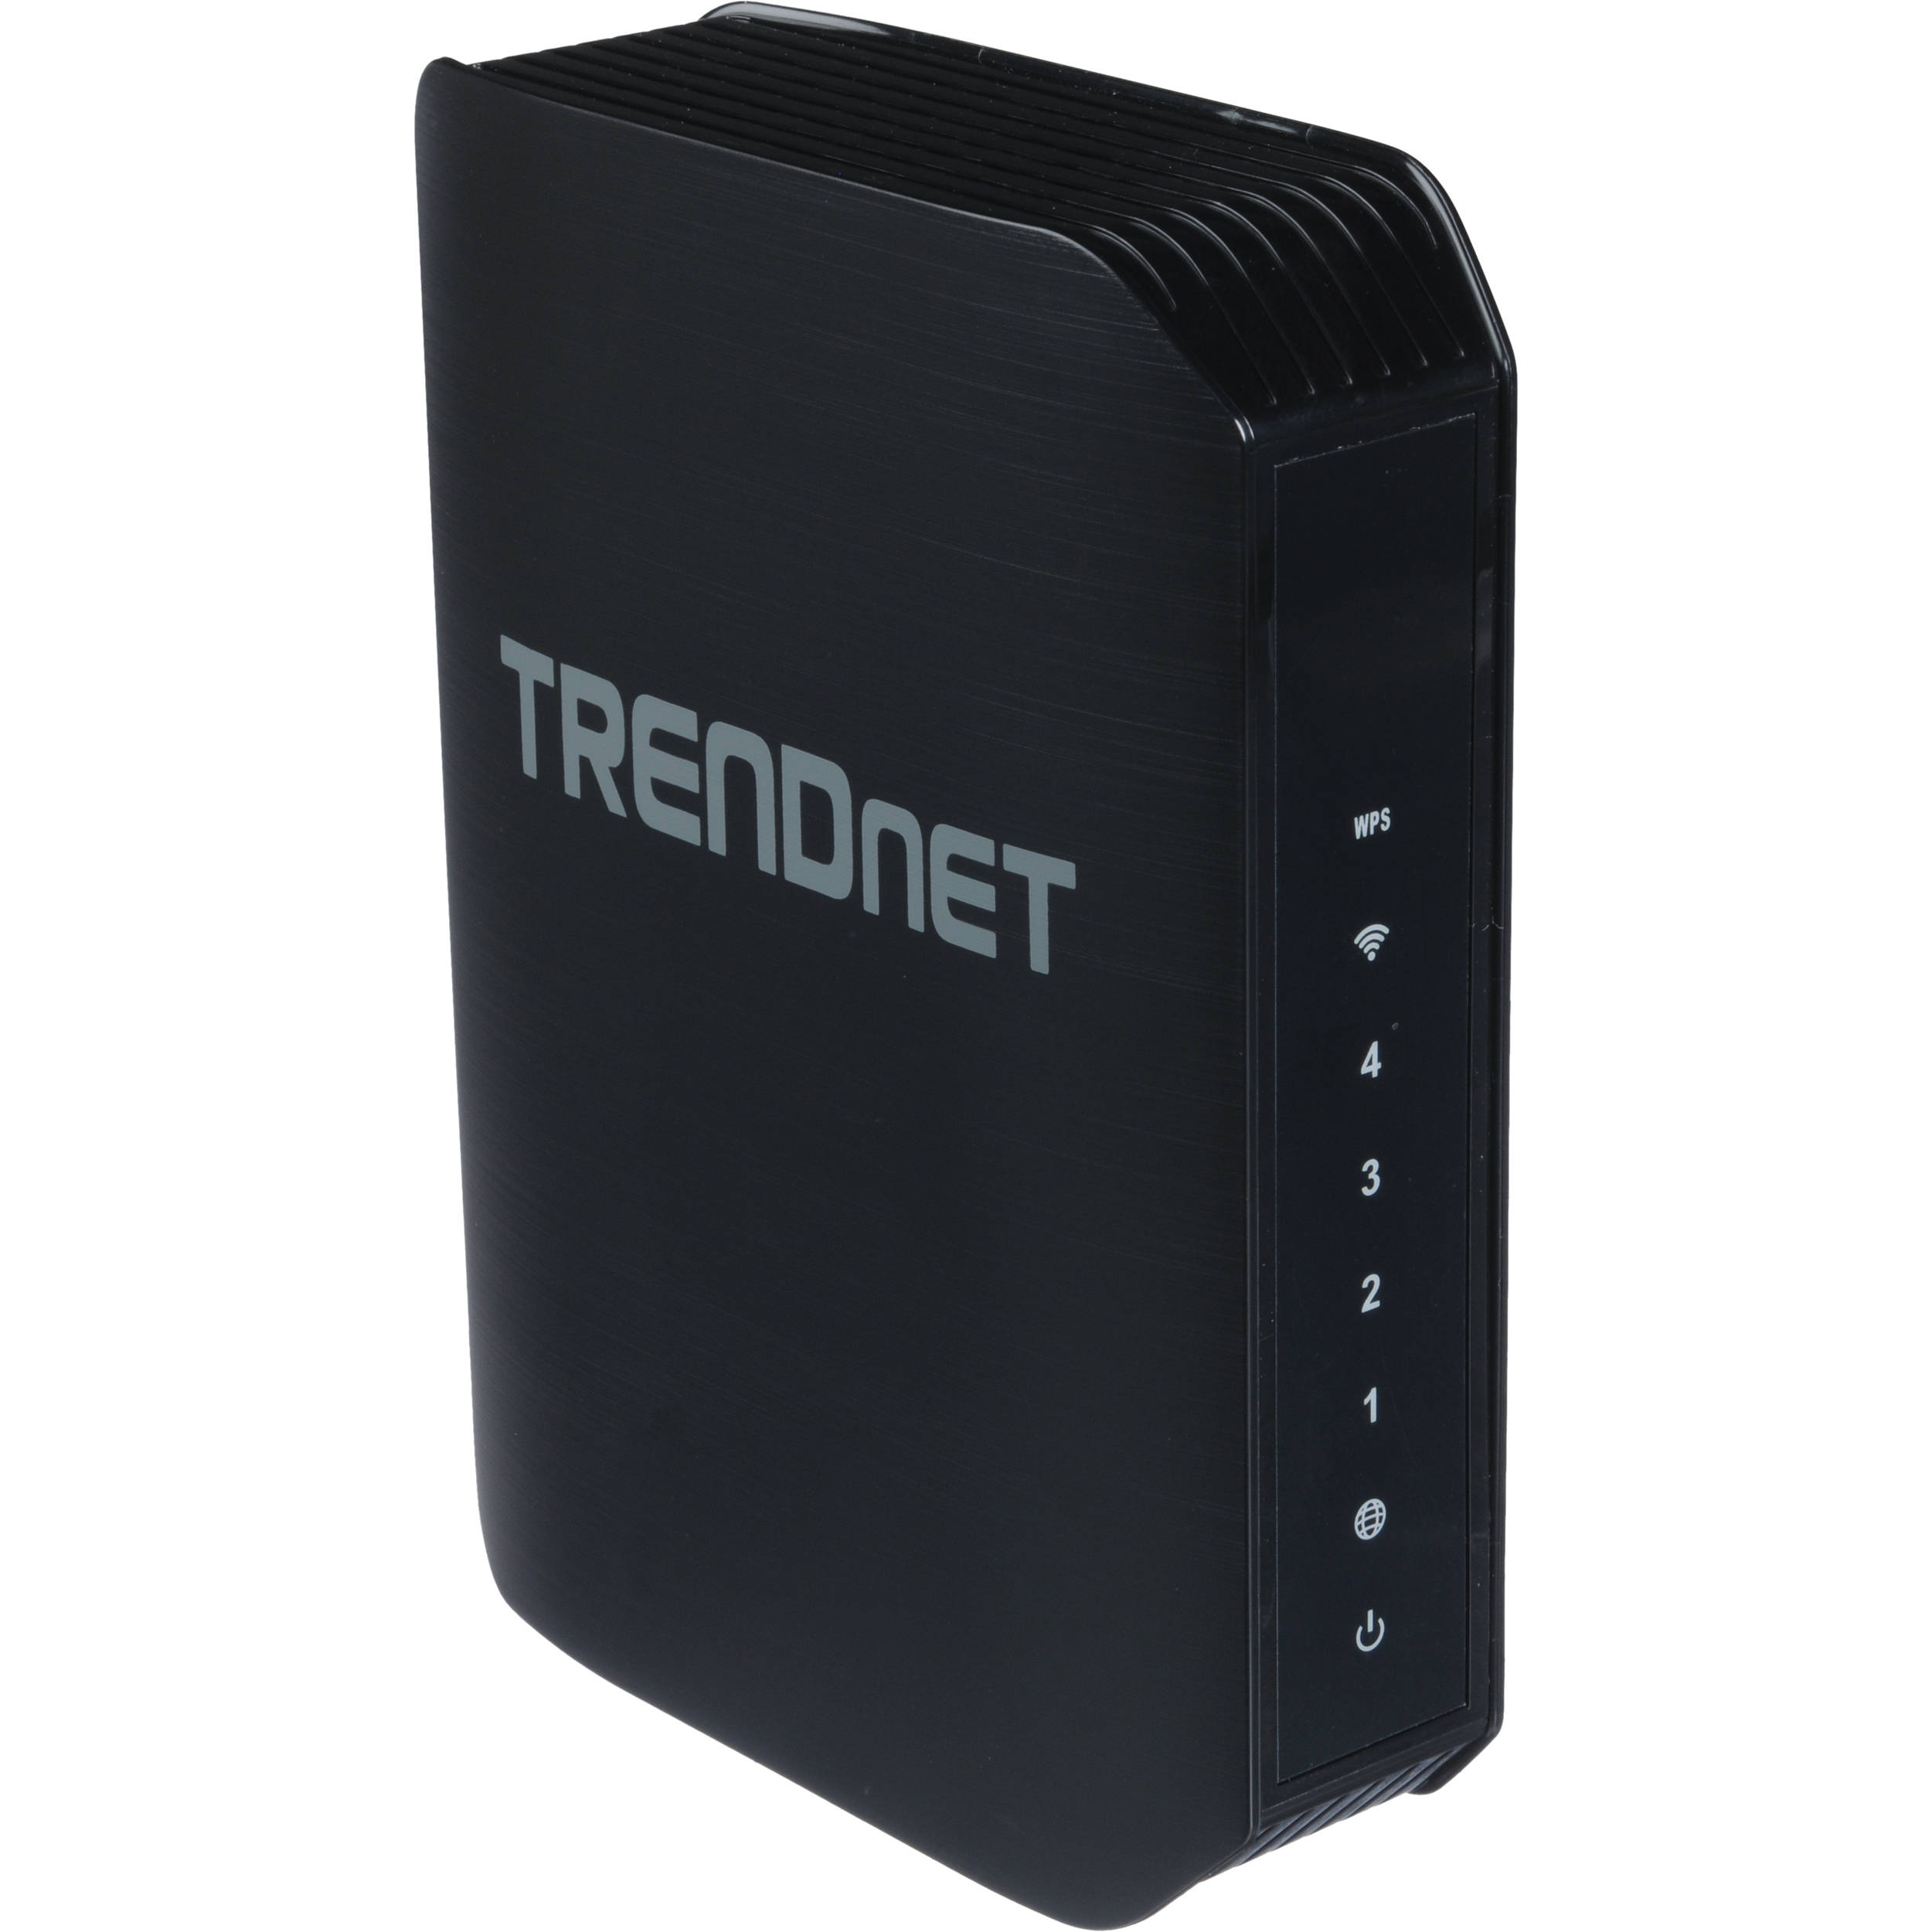 TRENDnet TEW-751DR Router Vista